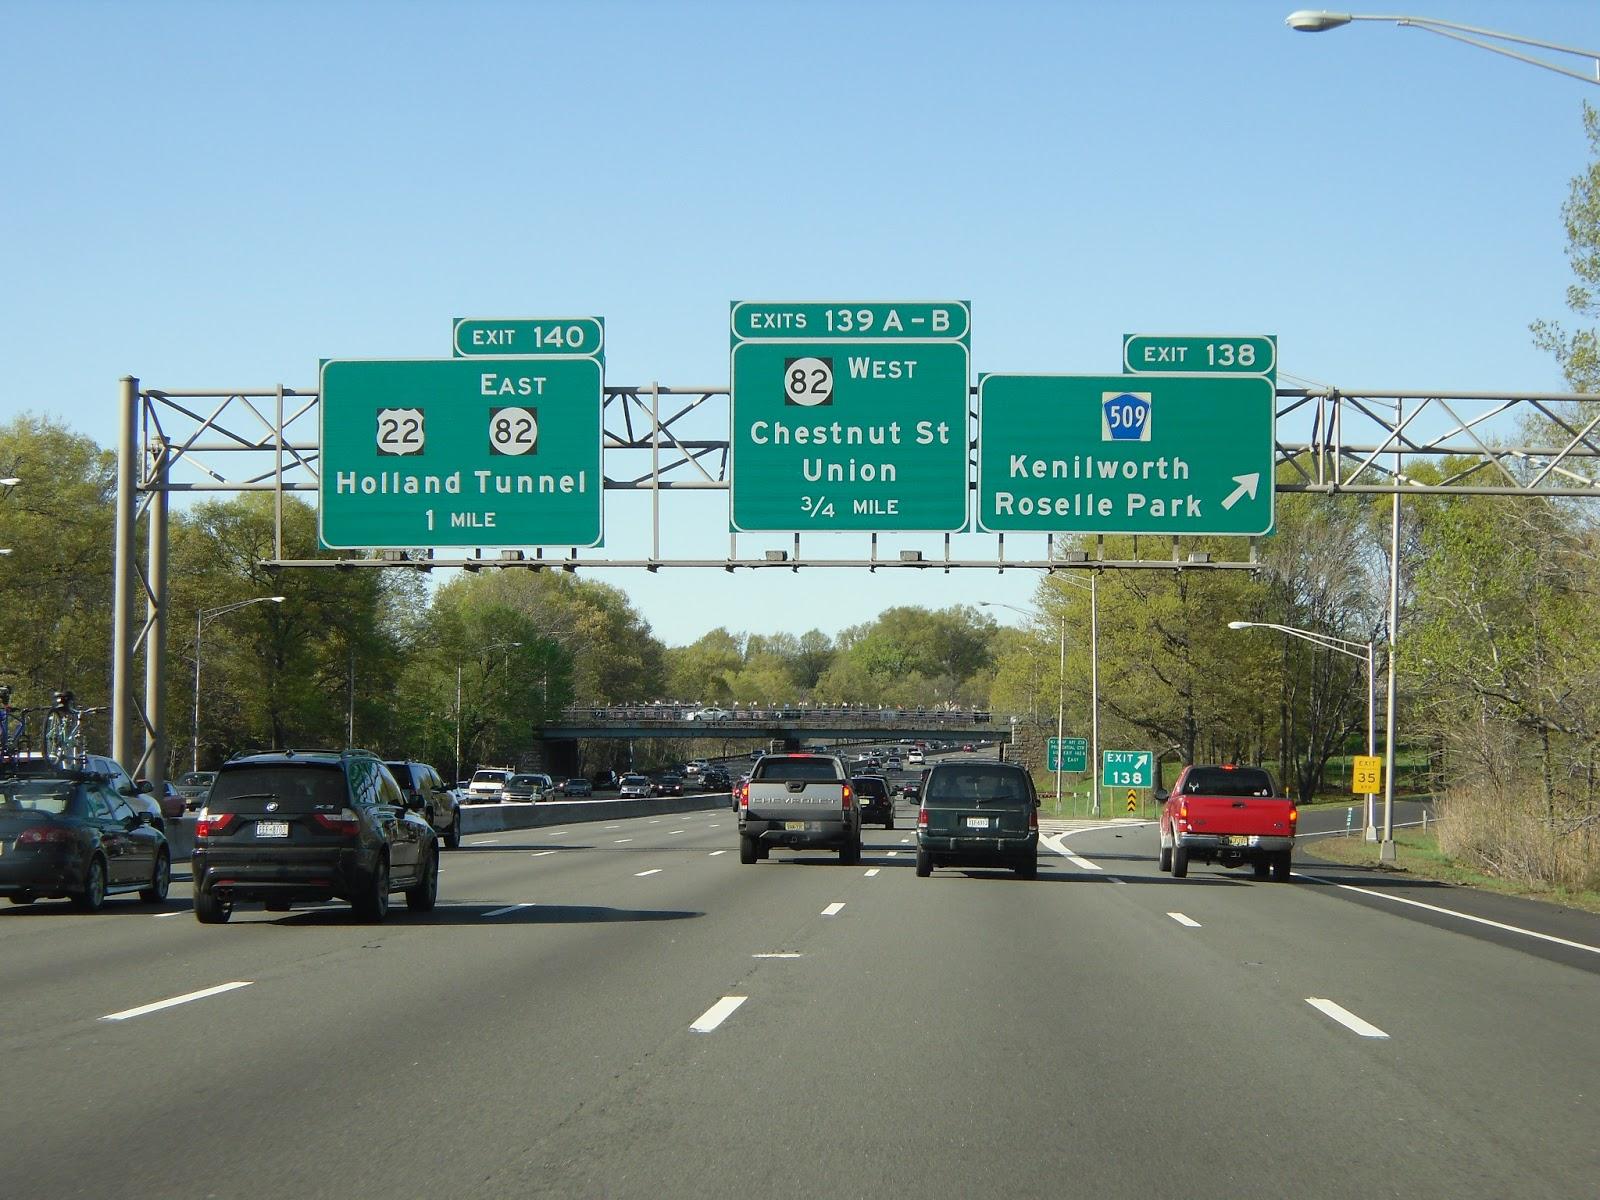 Philadelphia Mafia Bust Fbi Smashes South Jersey Drug Pipeline